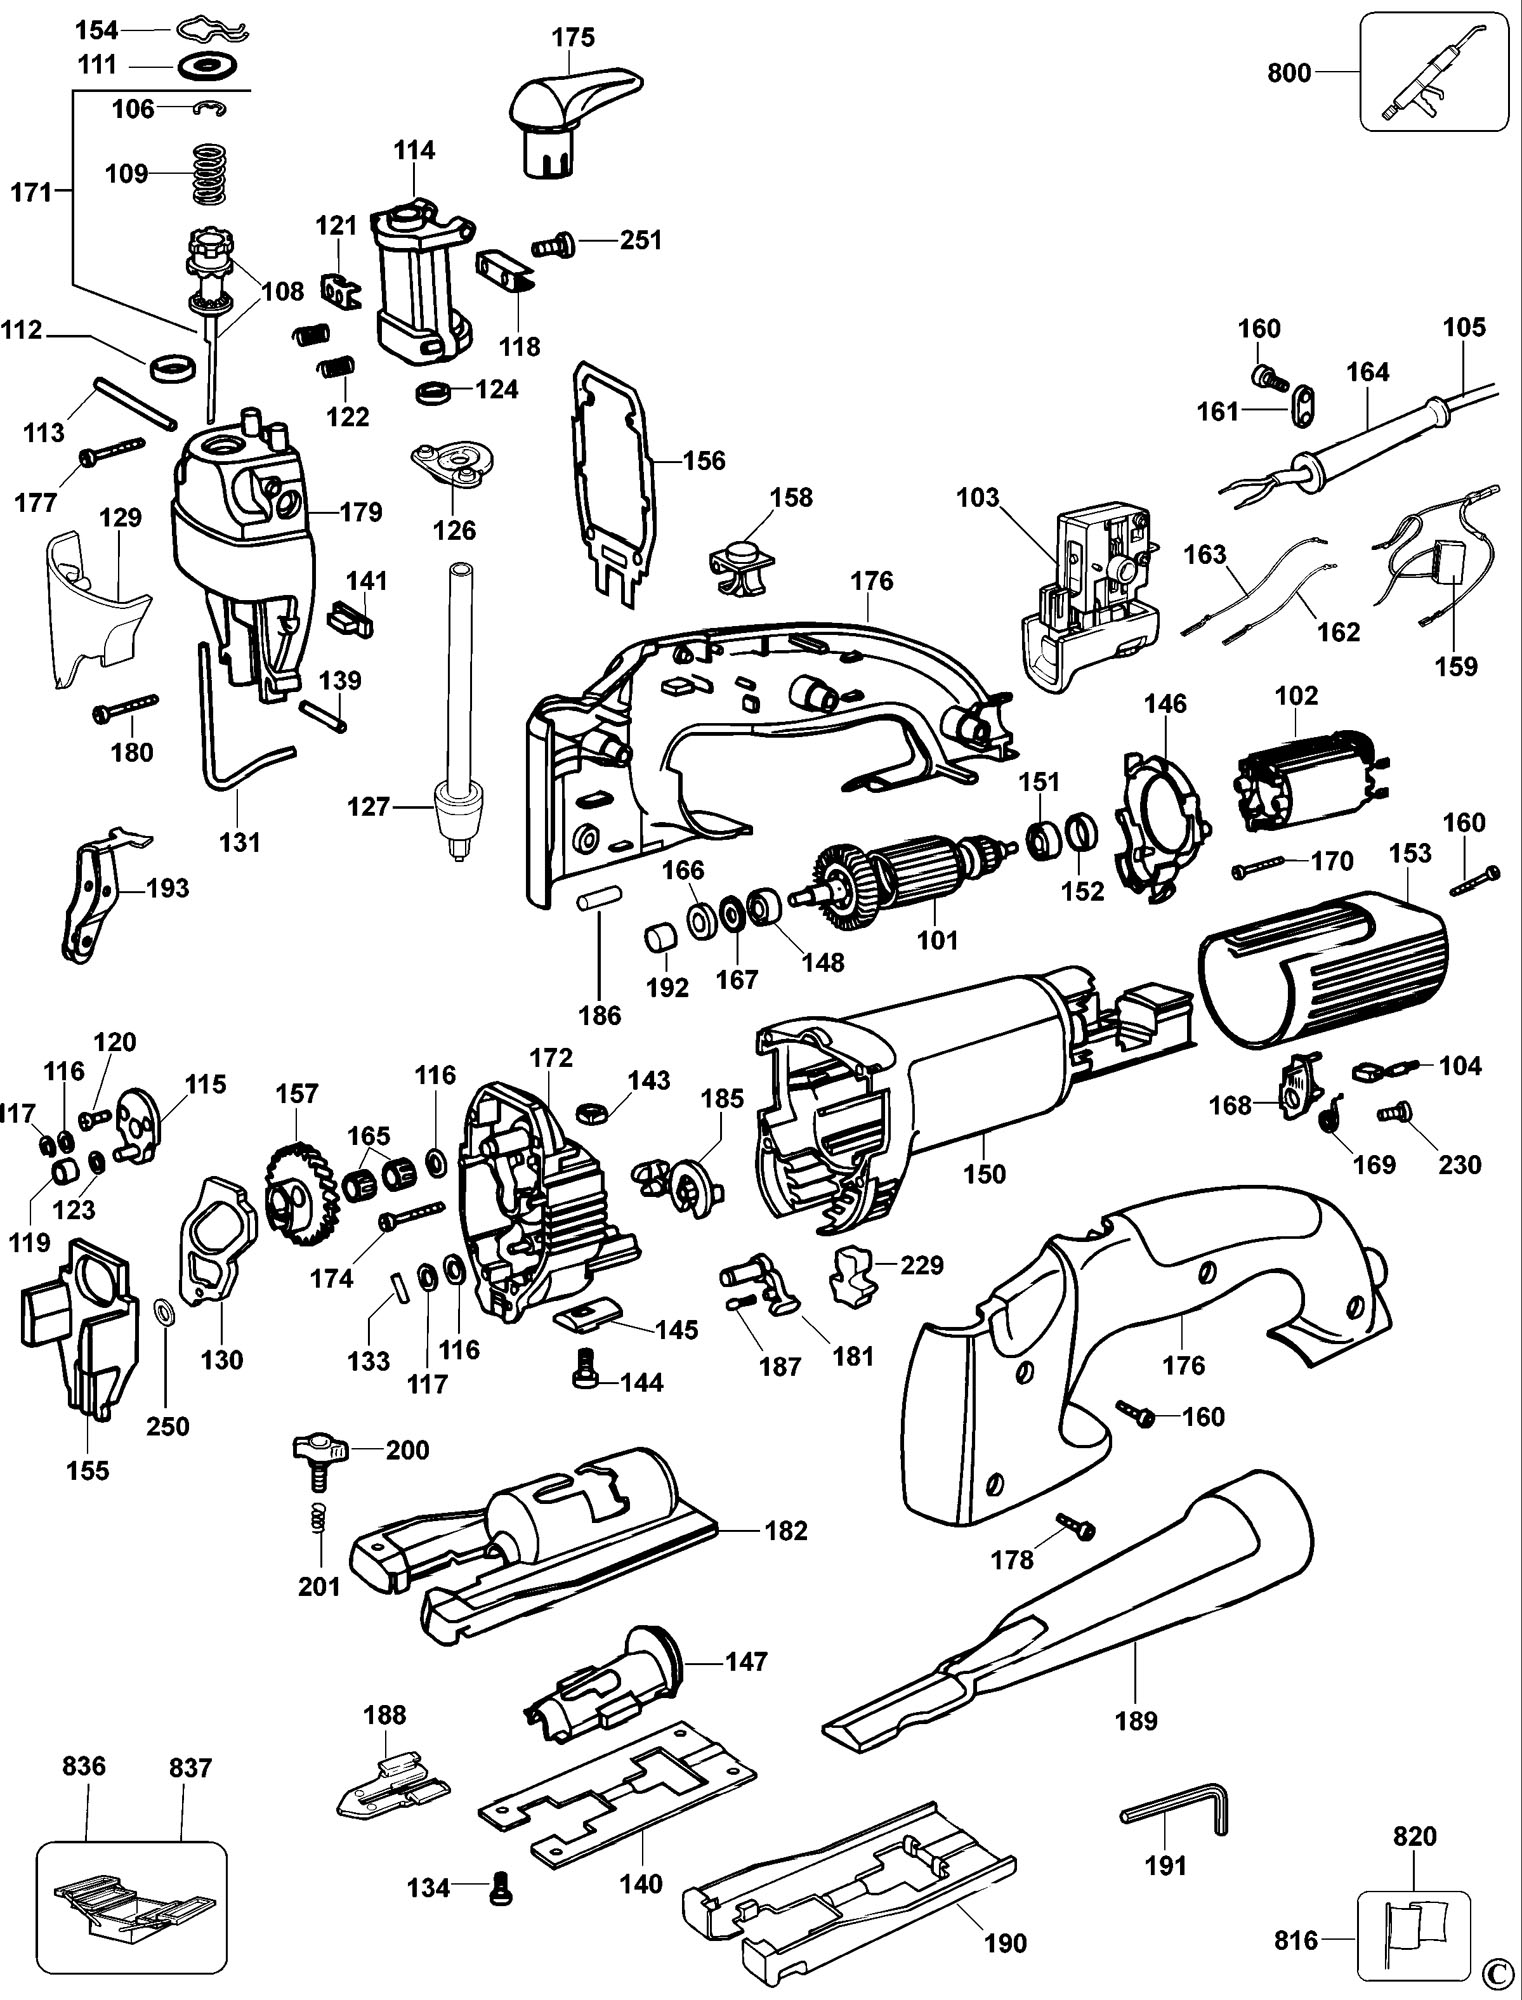 Spares For Dewalt Dw321 Jigsaw Type 3 Spare Dw321 Type 3